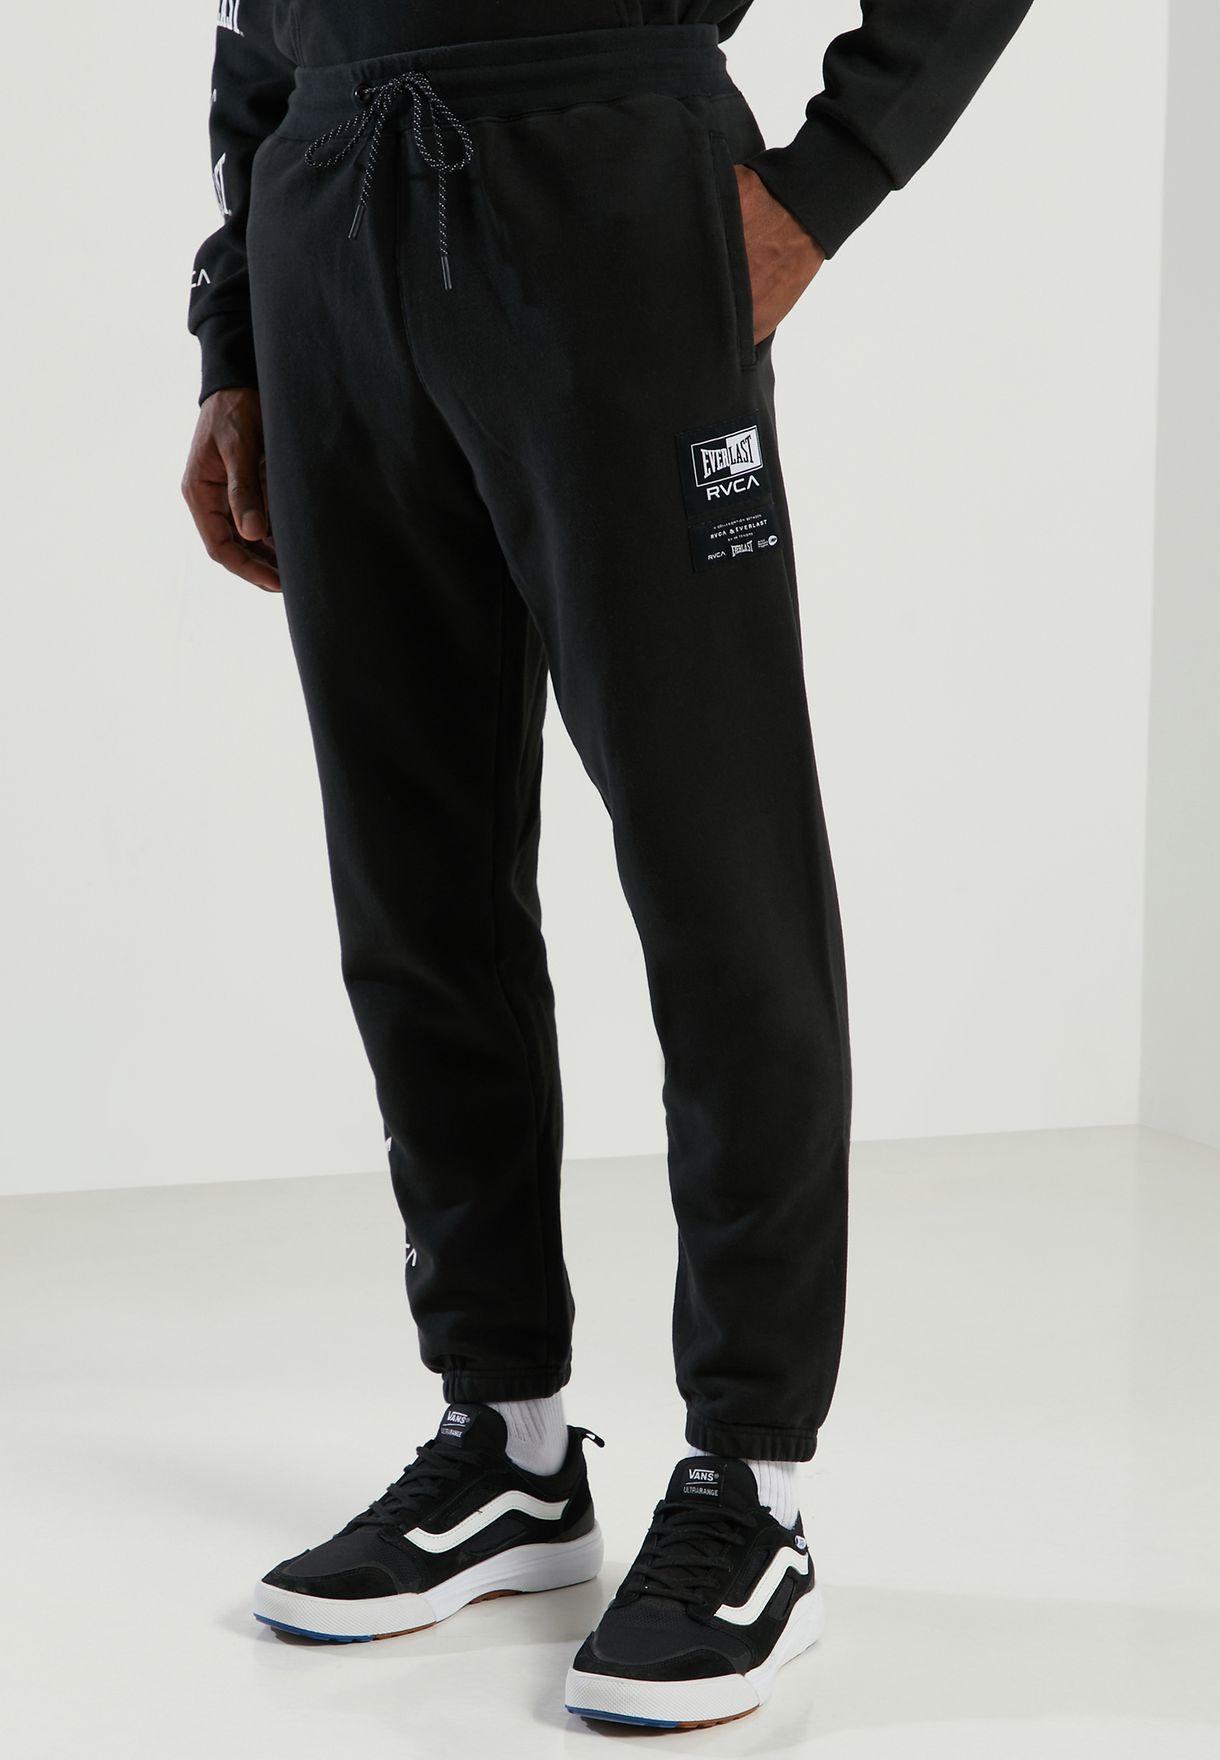 Everlast Sport Sweatpants